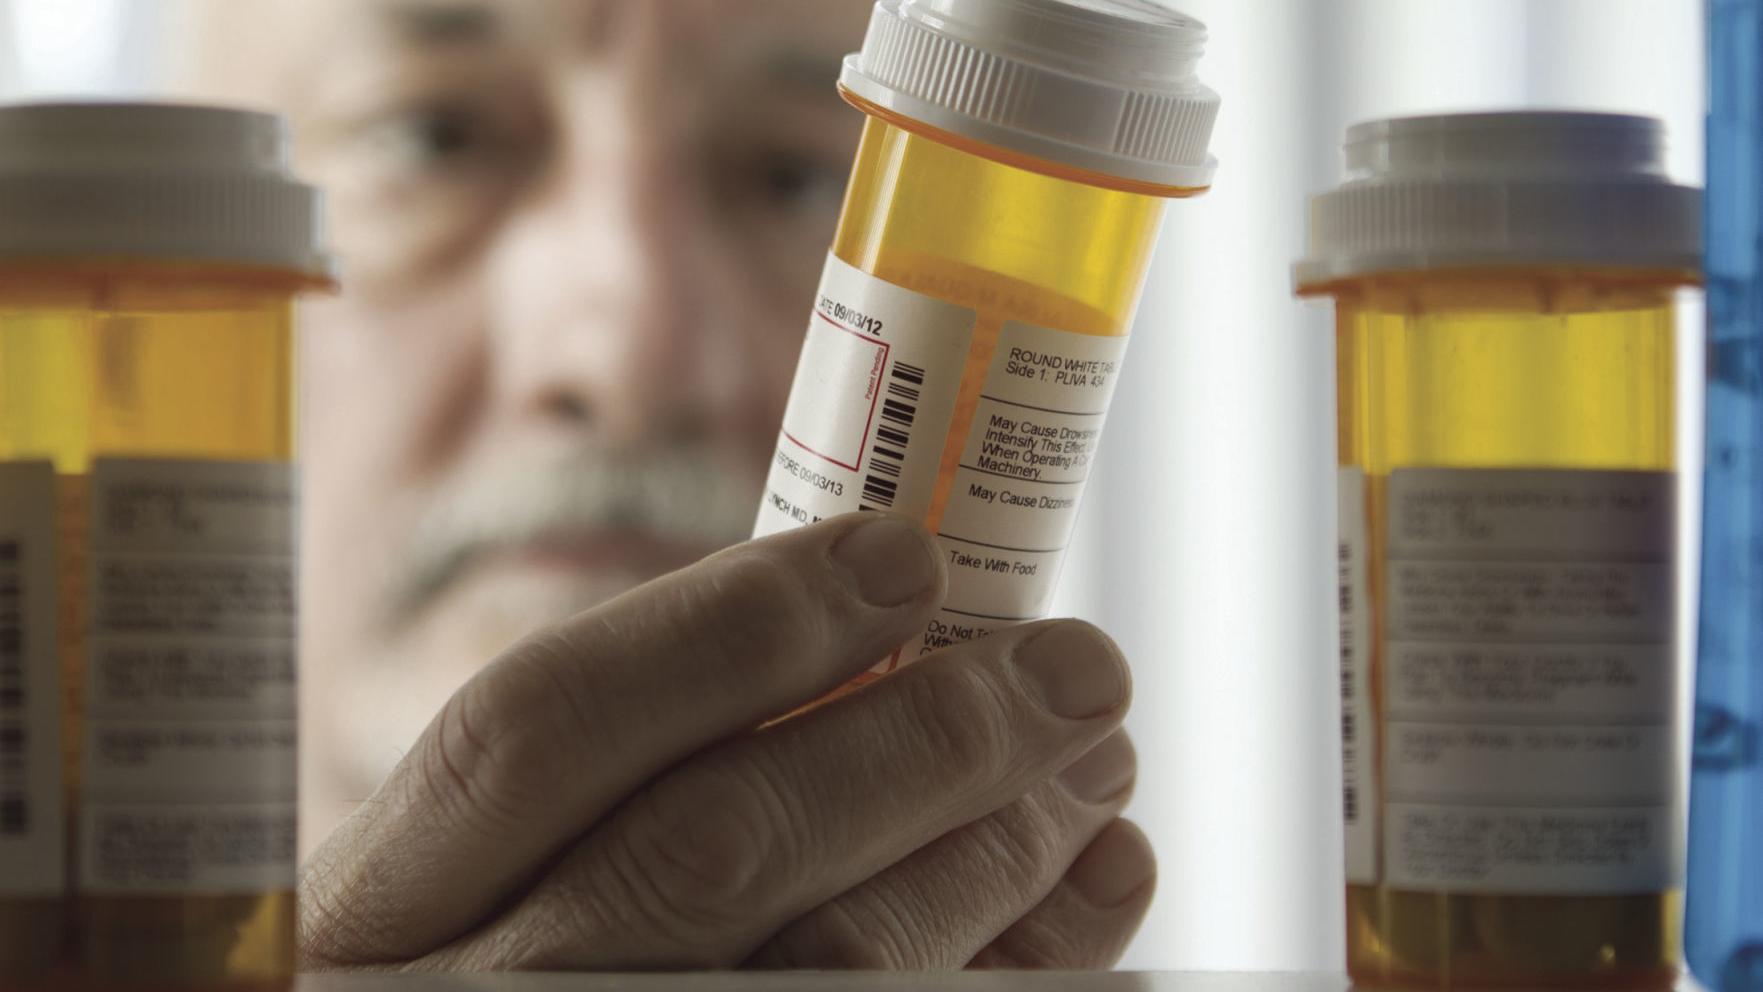 Audit report raises concerns with effectiveness of prescription drug registry